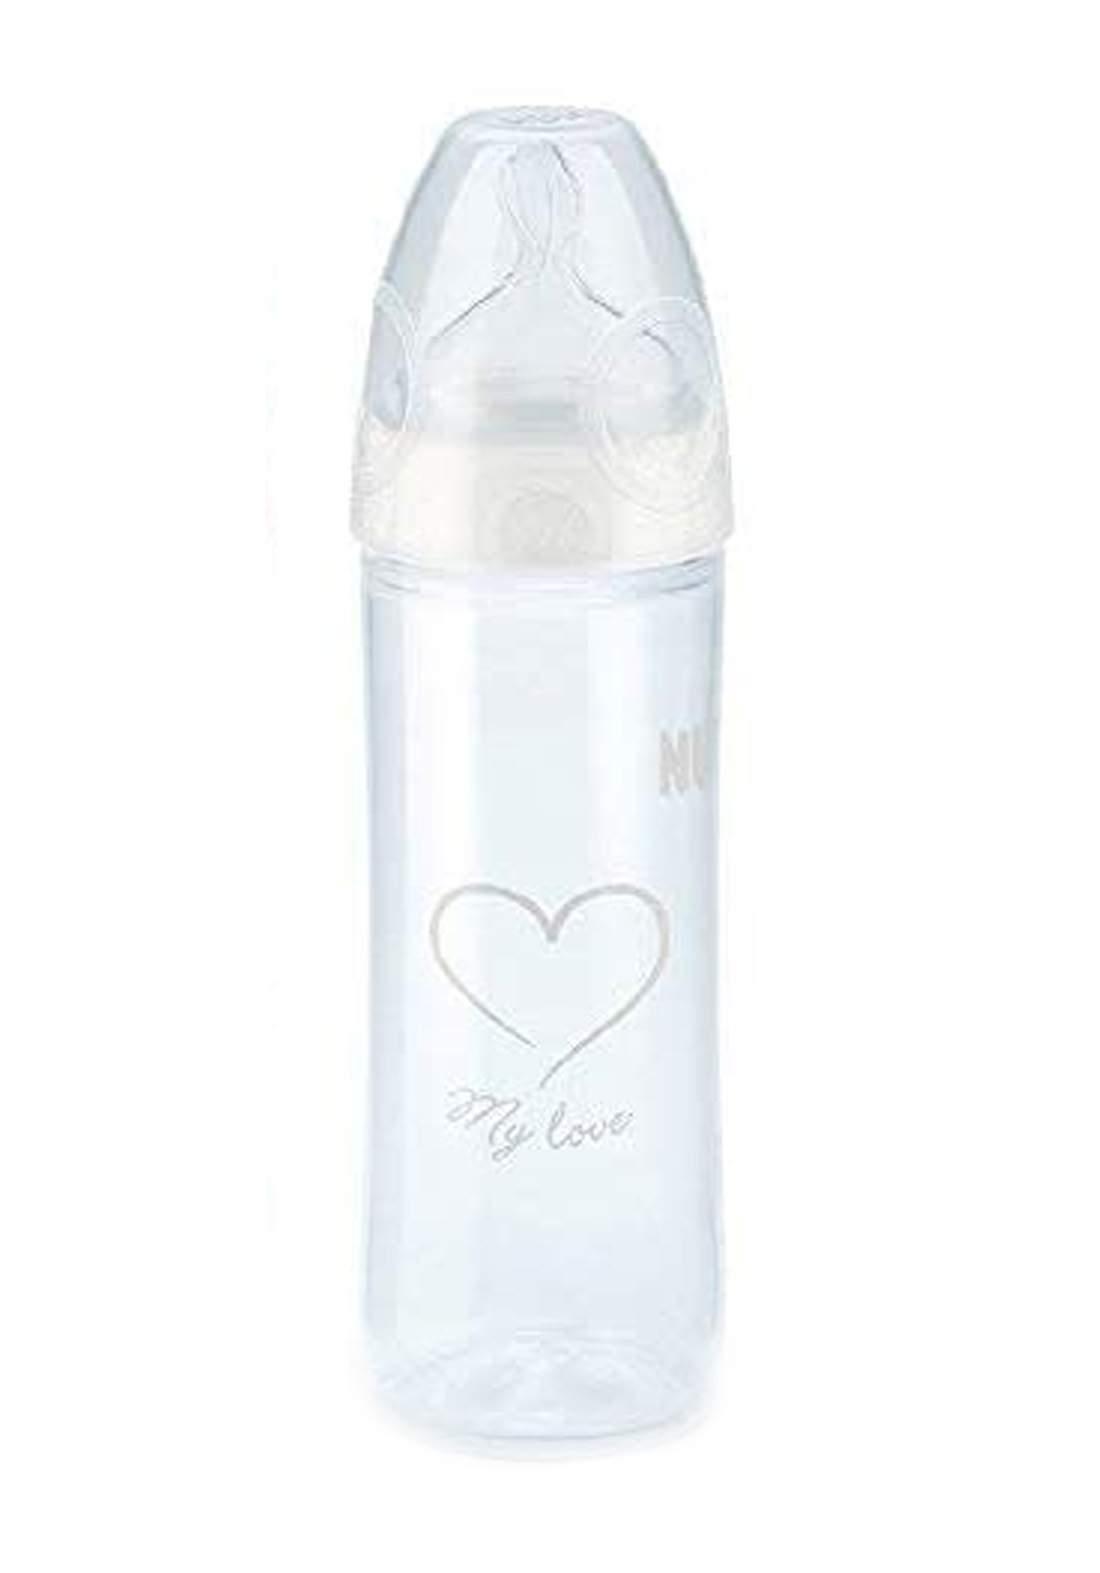 Nuk First Choice  PP Bottle New Classic 250ml  6-18  months رضاعة أطفال